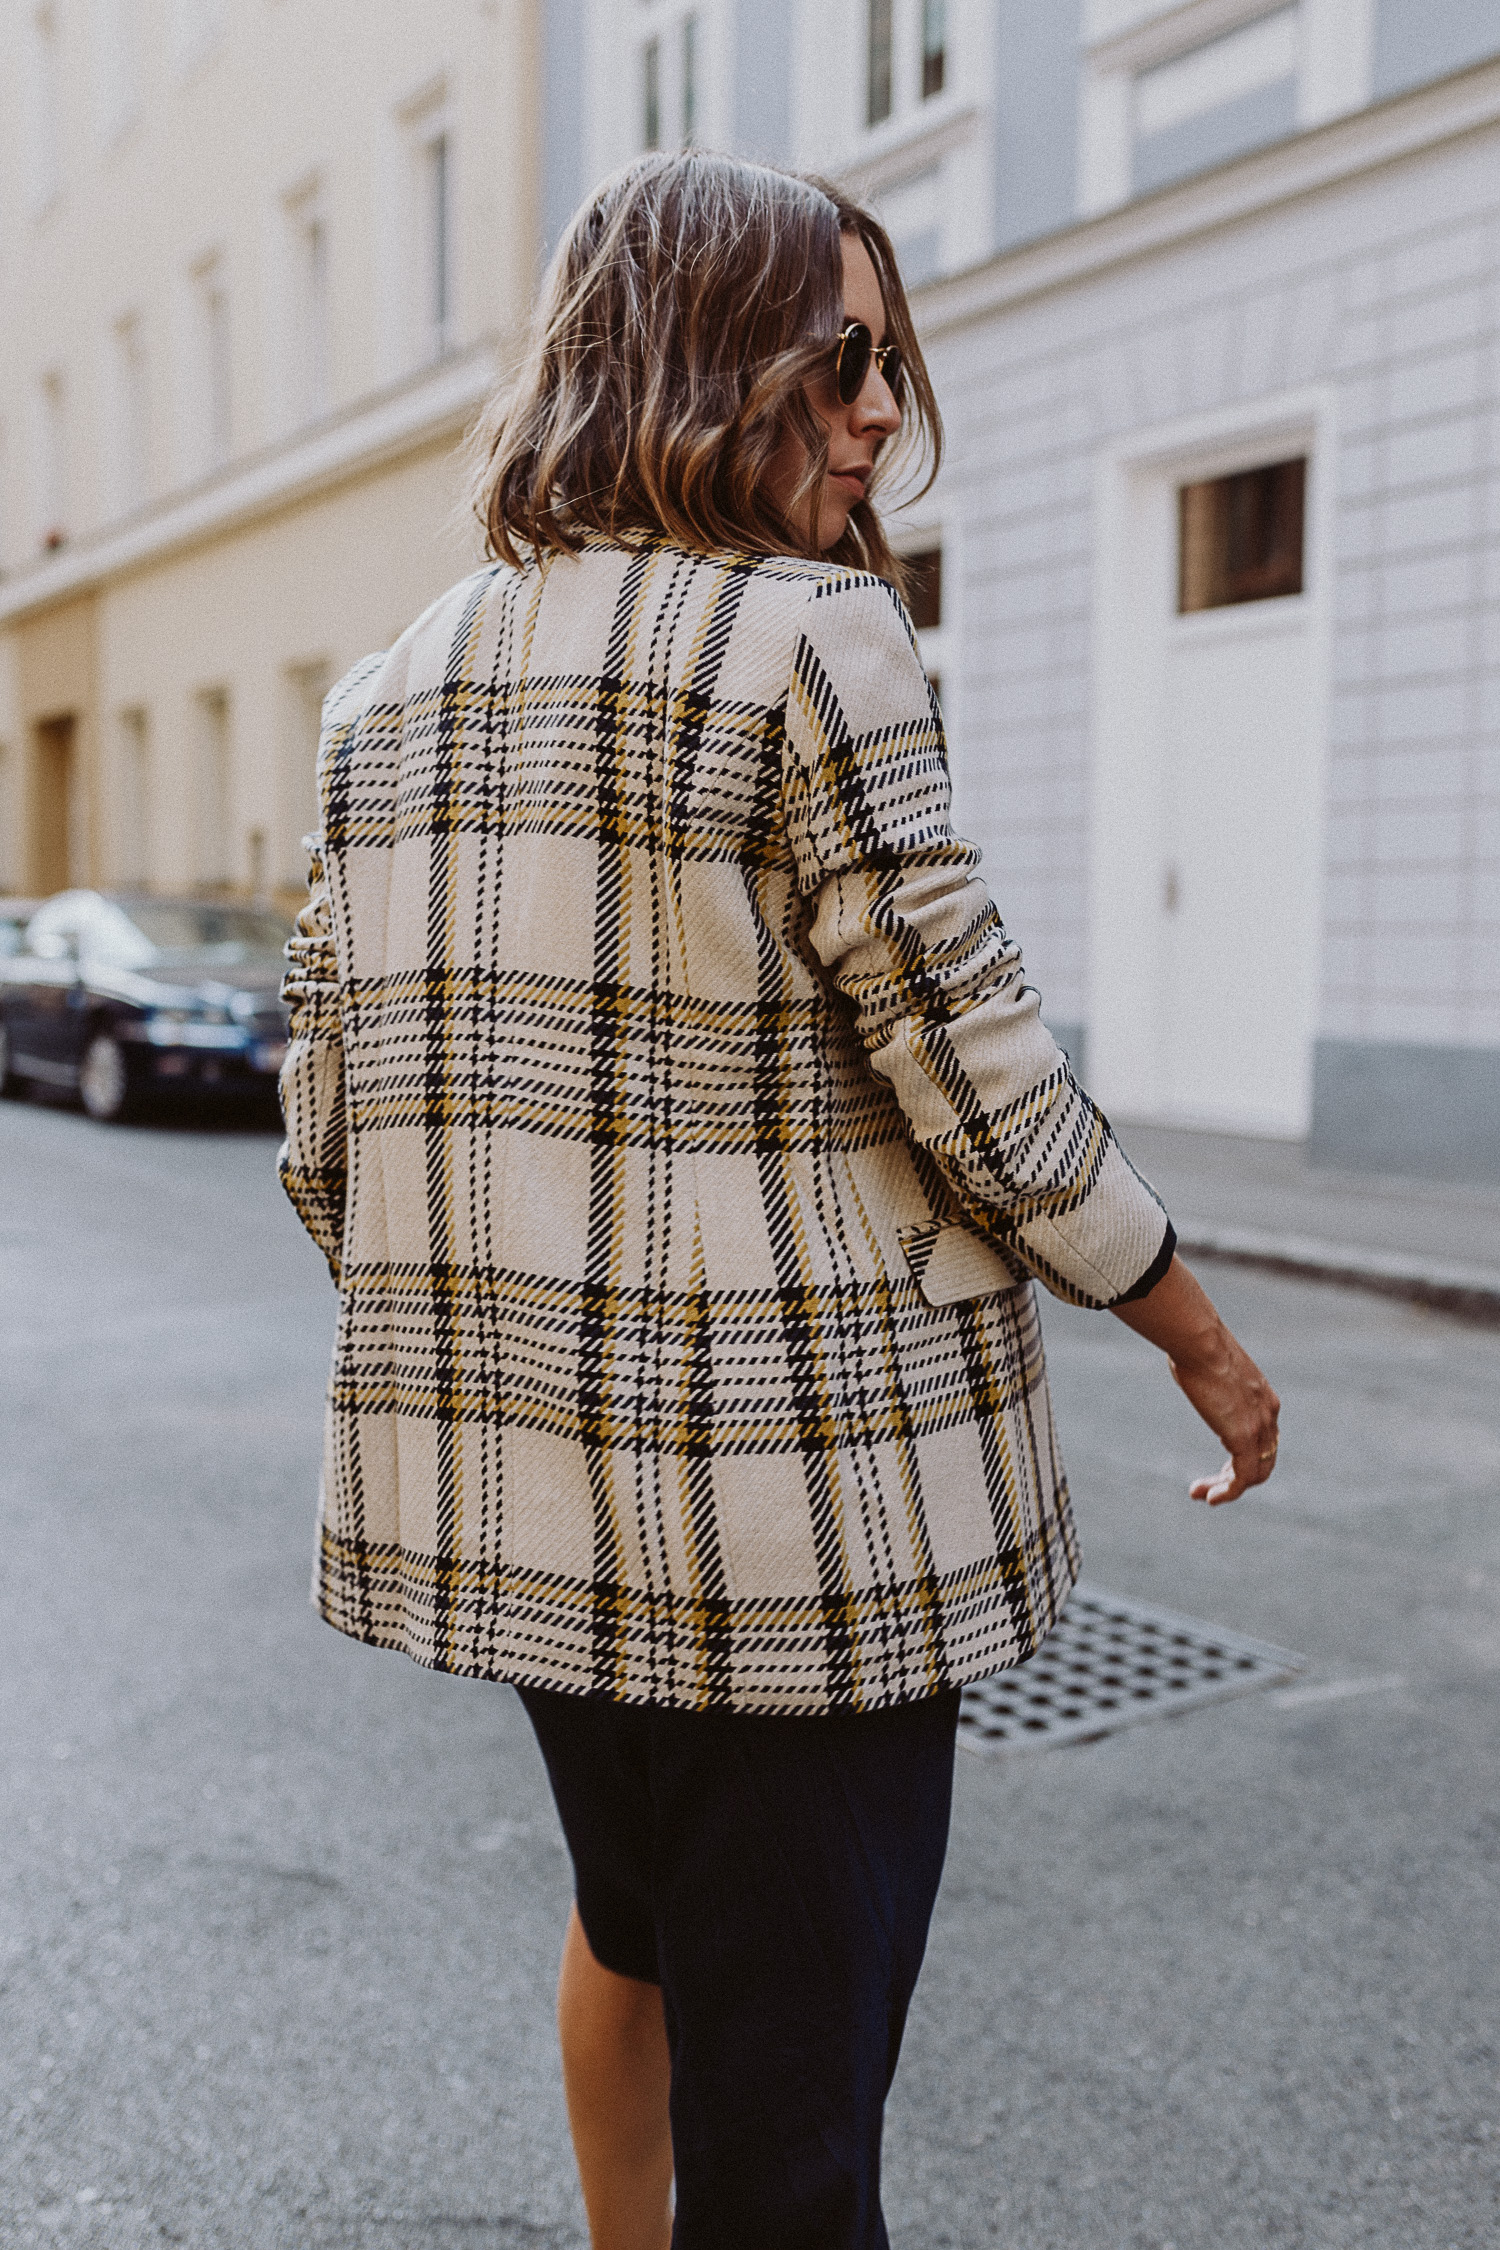 Herbst Trend Karo Blazer - The Daily Dose